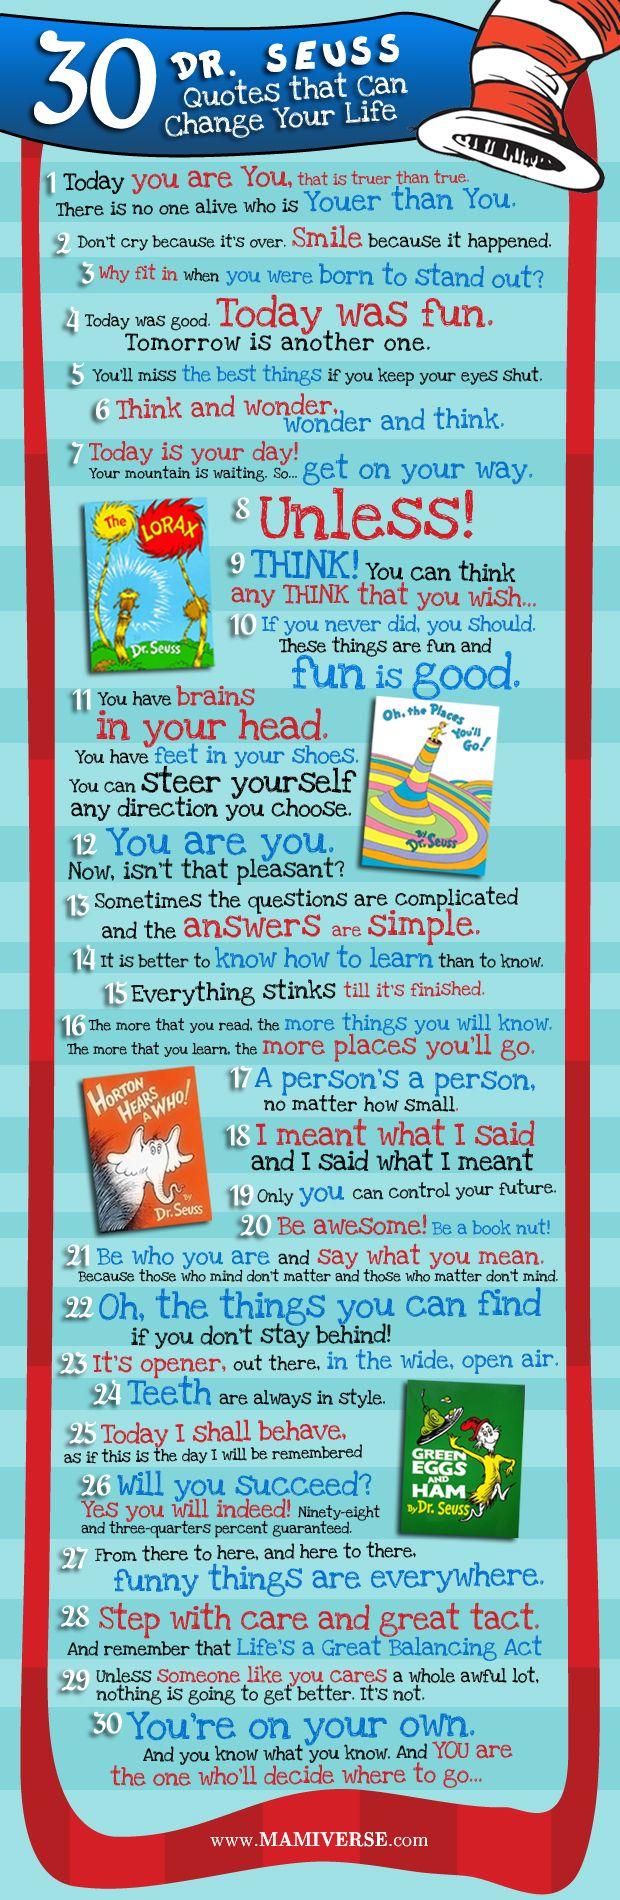 Dr Seuss Quotes About Friendship Childhood Stories Do Promote Positive Mindsets  Inspirations